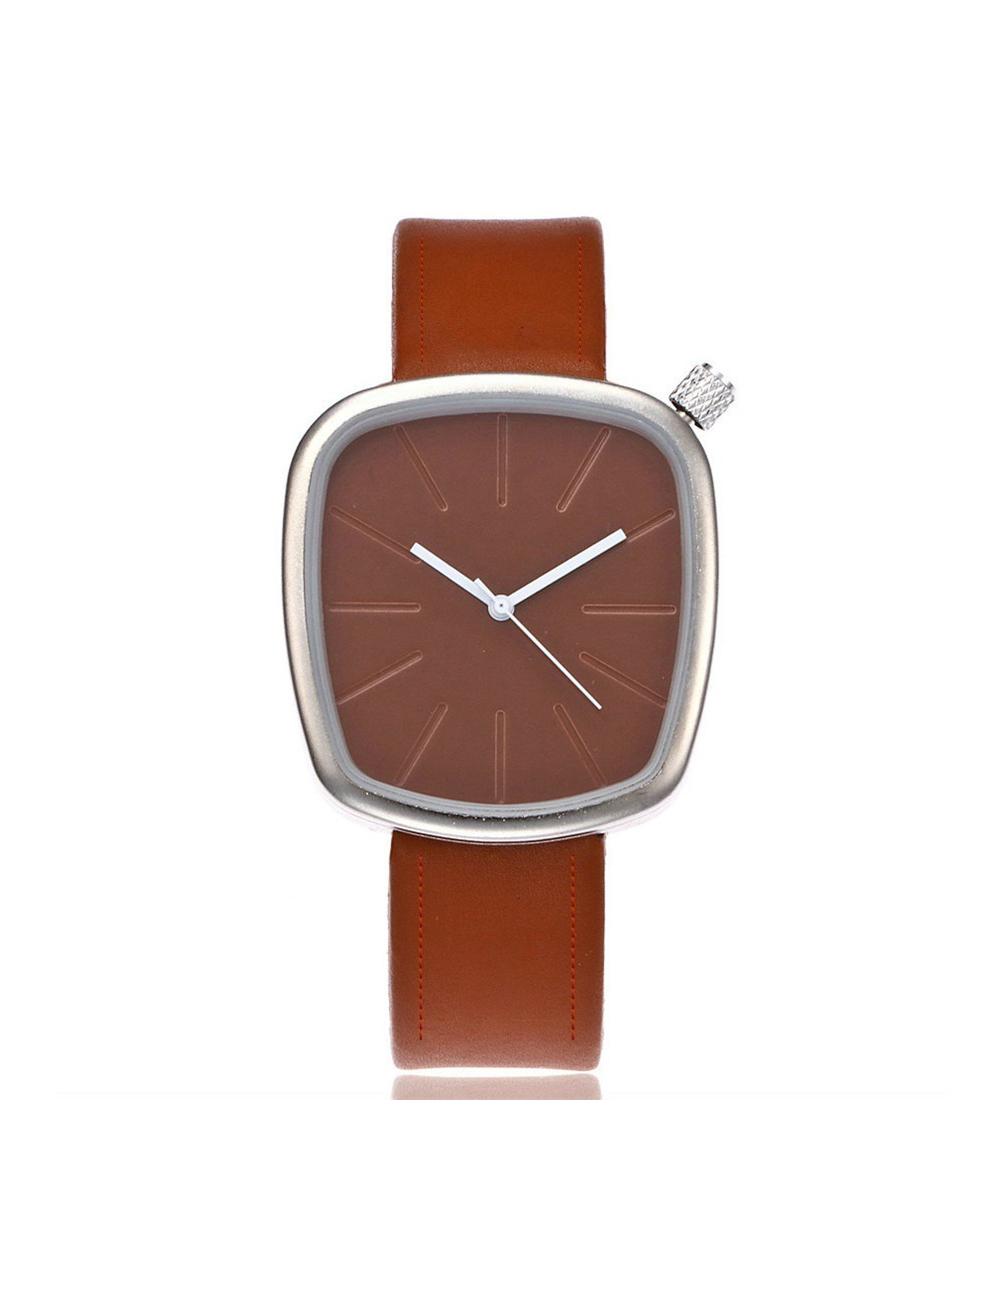 Reloj Glamour Dayoshop $39.900